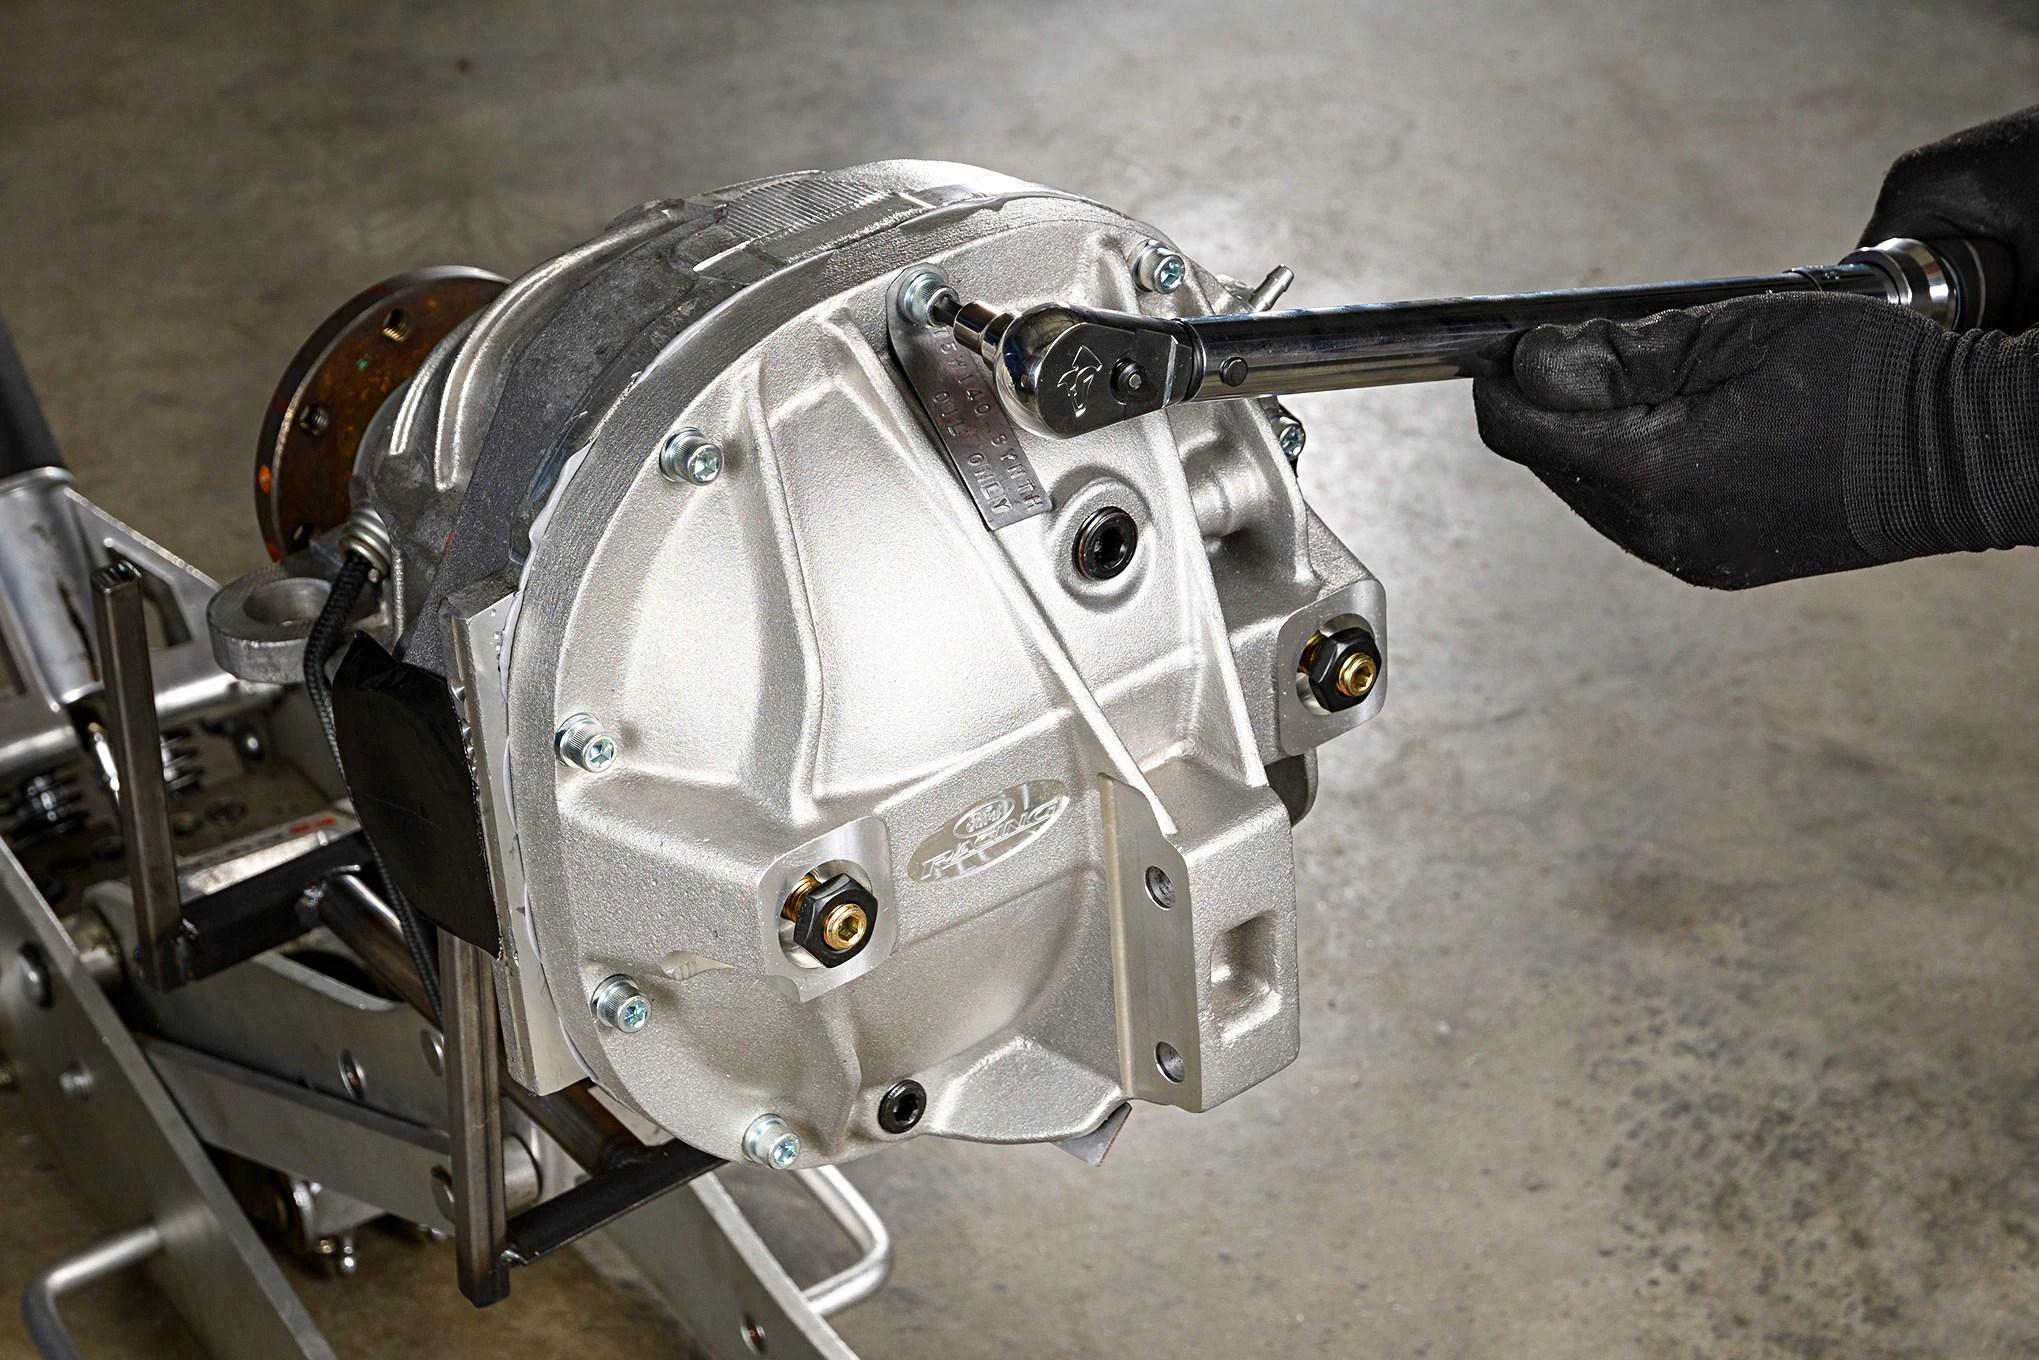 medium resolution of 001 mustang cobra differential cover girdle torque